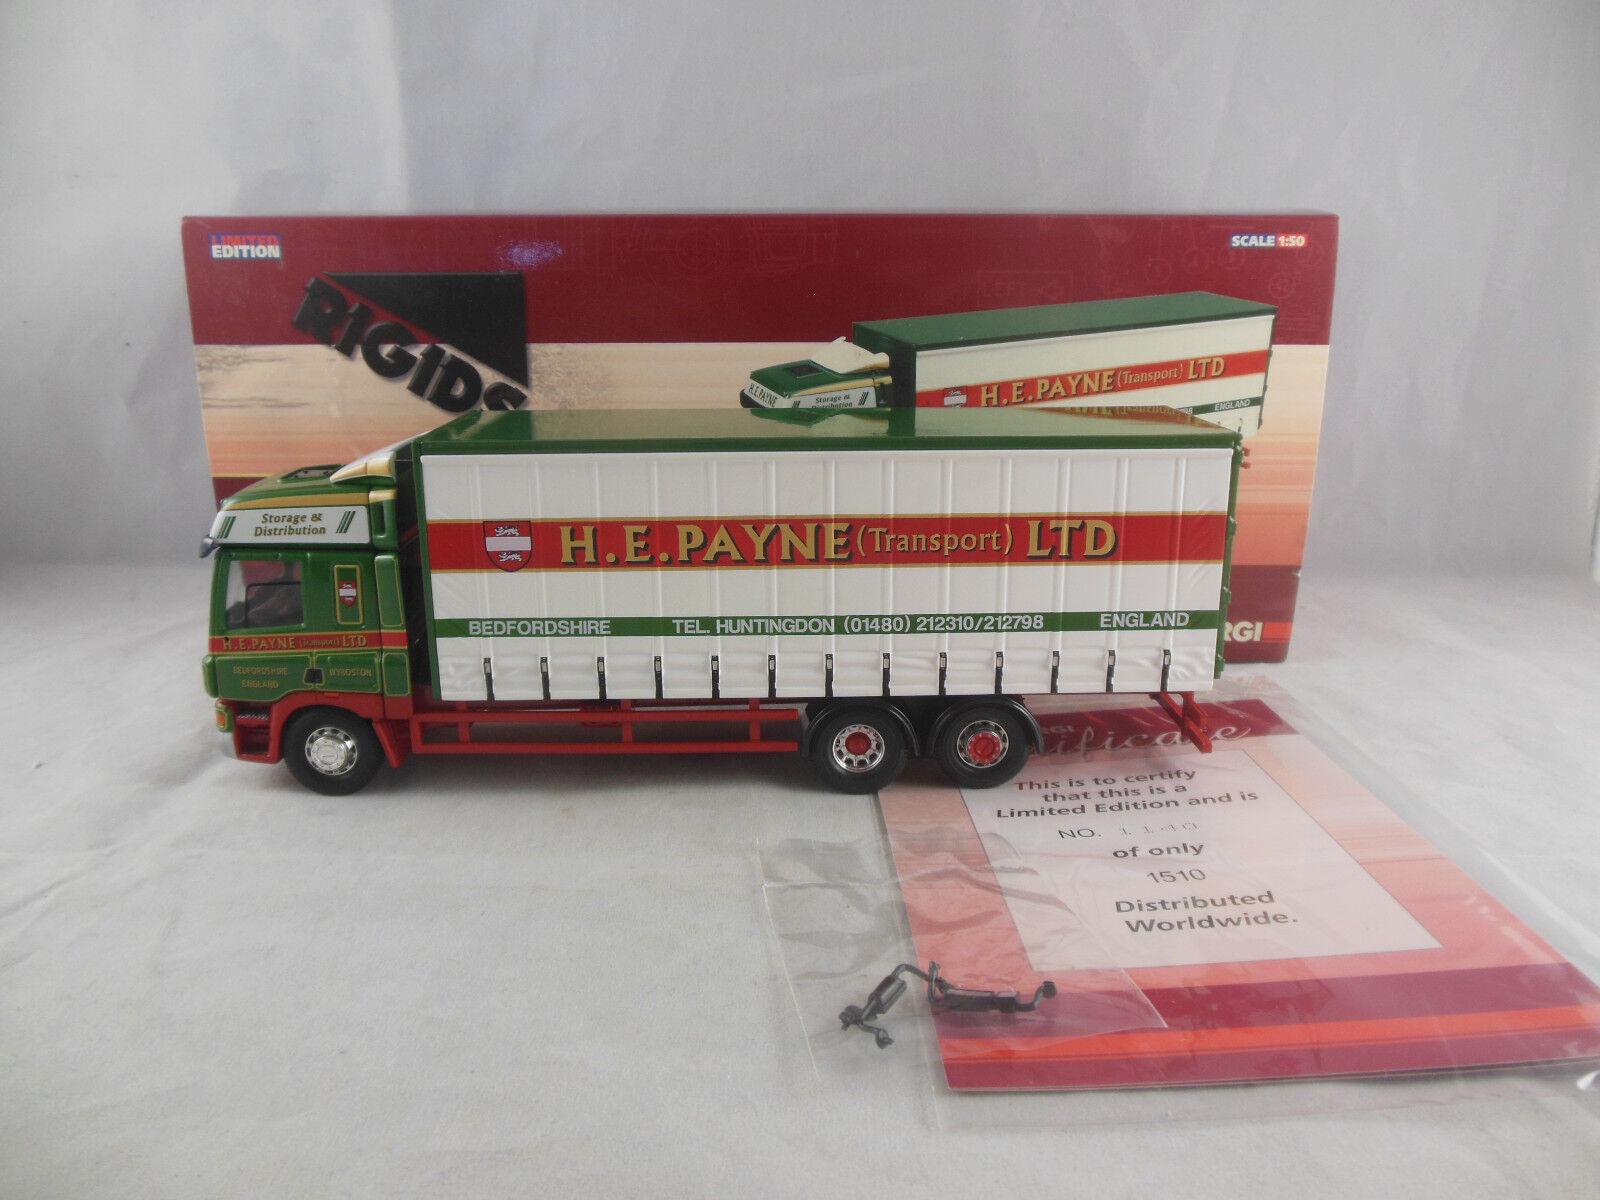 CORGI CC13618 DAF CF Curtainside camion H.E. Payne Transport Ltd échelle 1 50